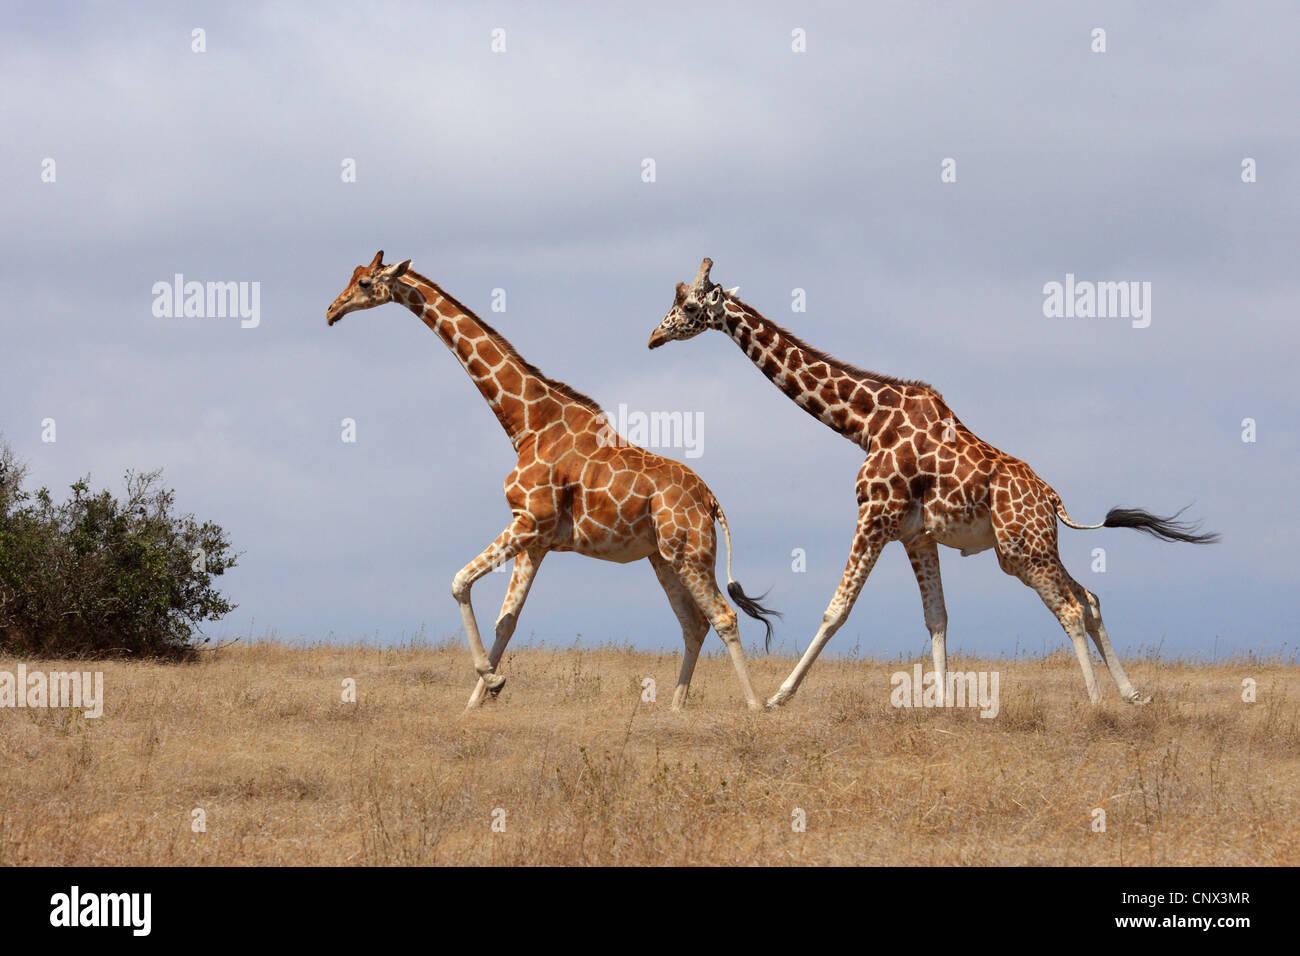 reticulated giraffe (Giraffa camelopardalis reticulata), two giraffes running across the savanna, Kenya, Sweetwater - Stock Image